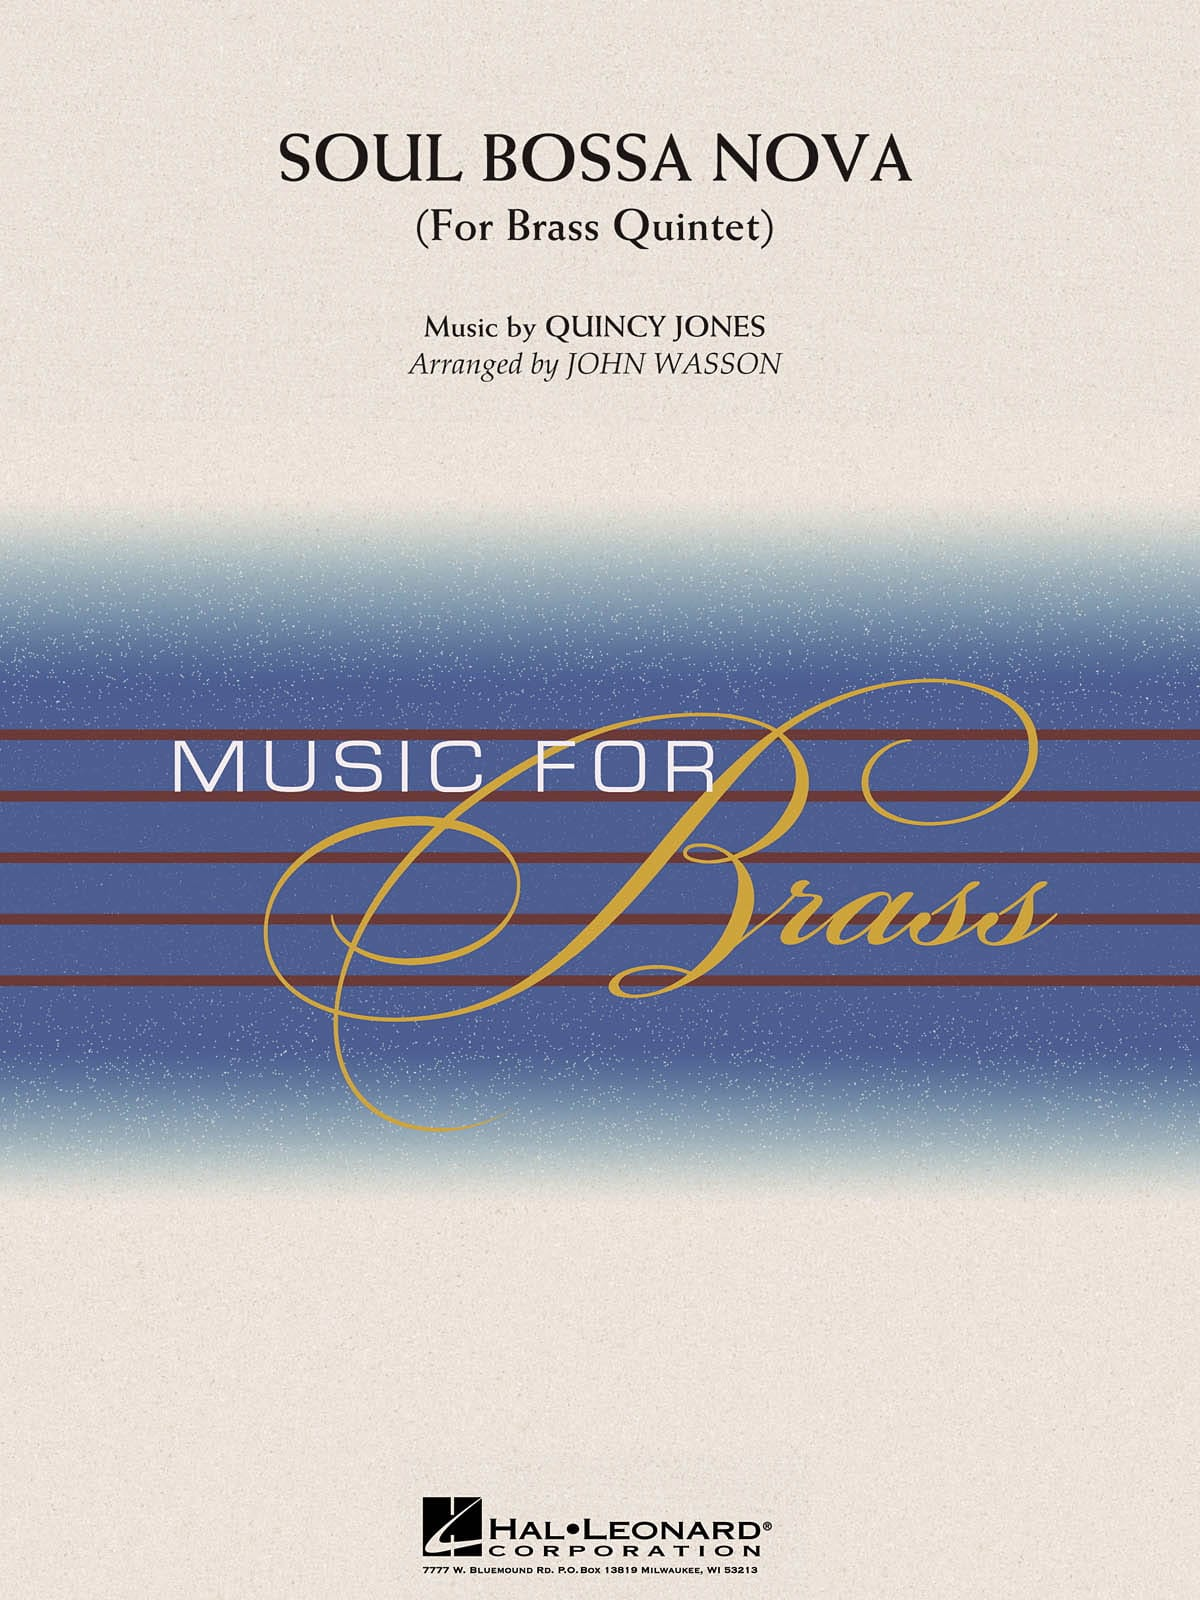 Soul Bossa Nova for brass quintet - Quincy Jones - laflutedepan.com